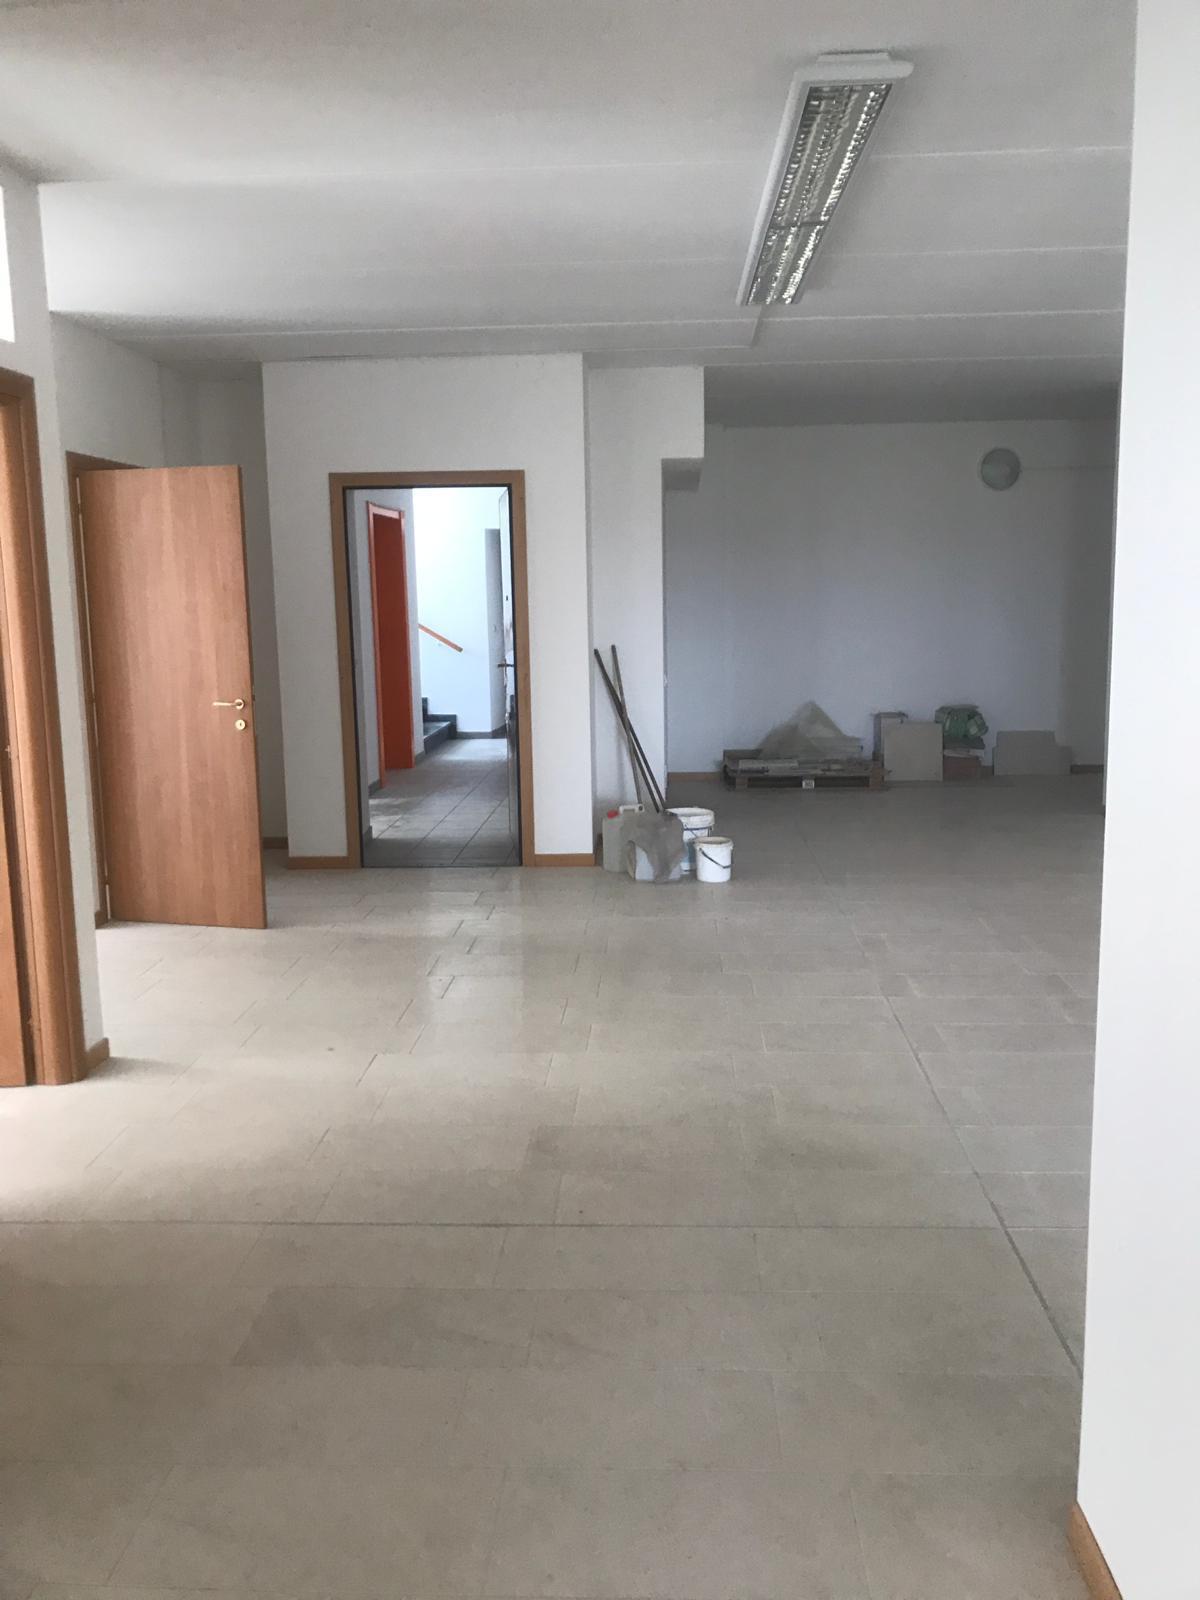 Ufficio a San Giuliano Terme